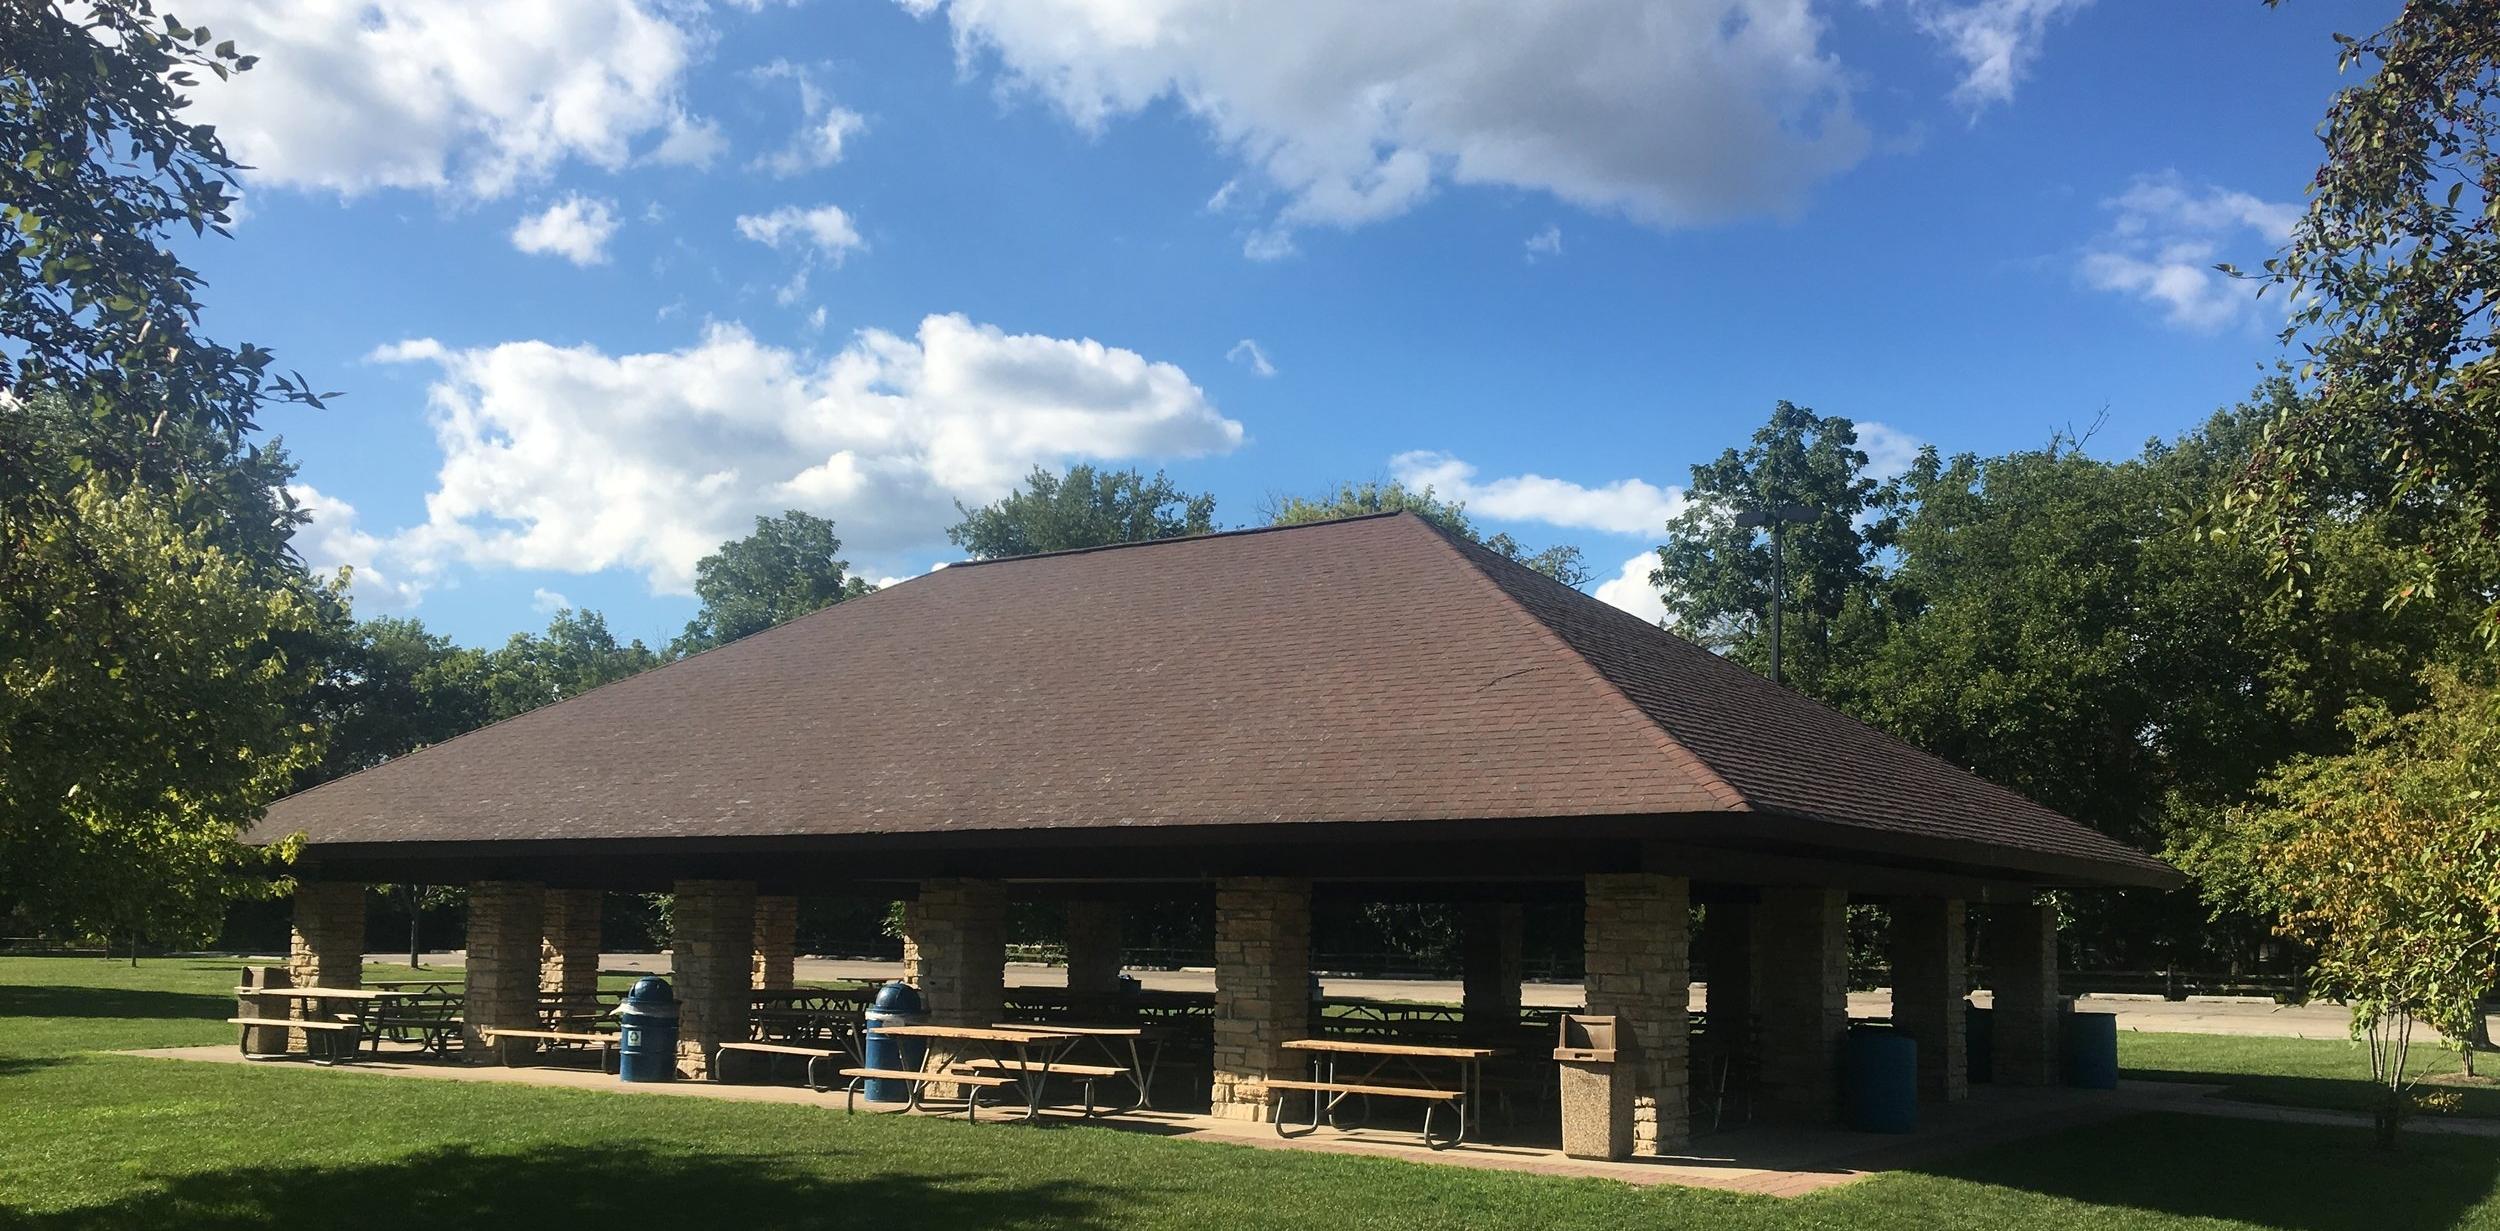 Naperville Riverwalk Grand Pavilion